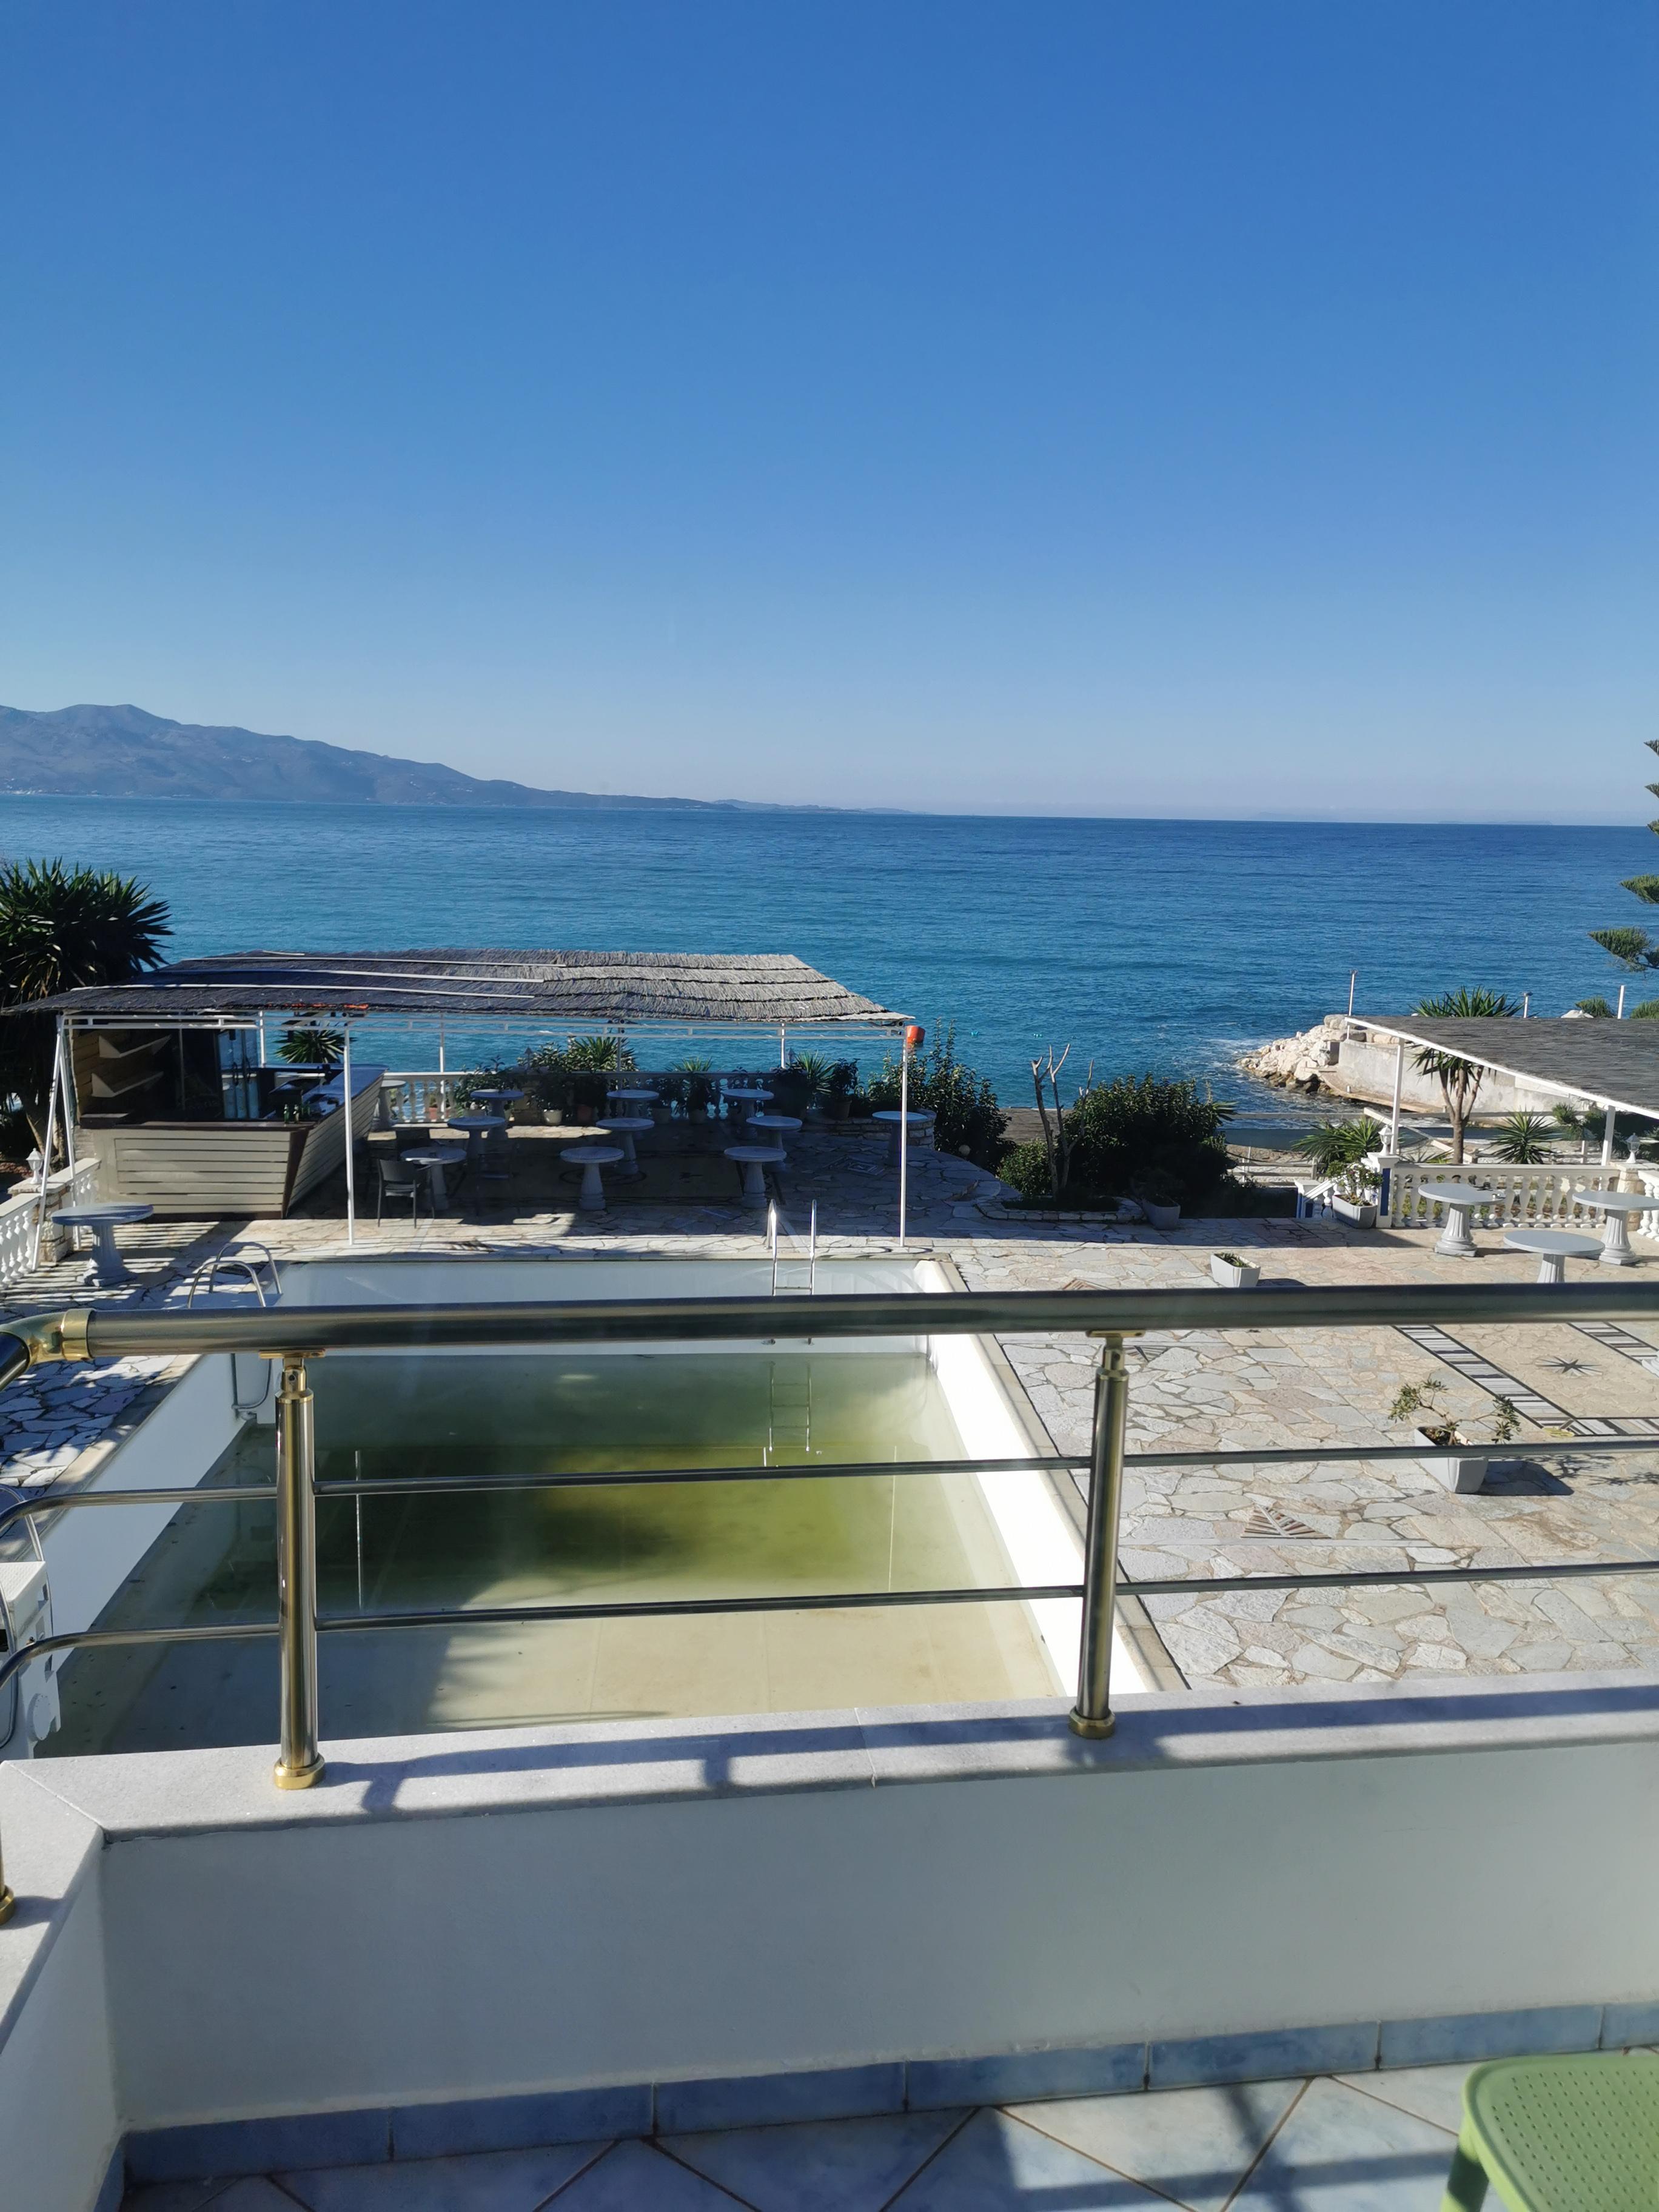 Letovanje Albanija hoteli, Saranda, autobus, Hotel Perla, terasa